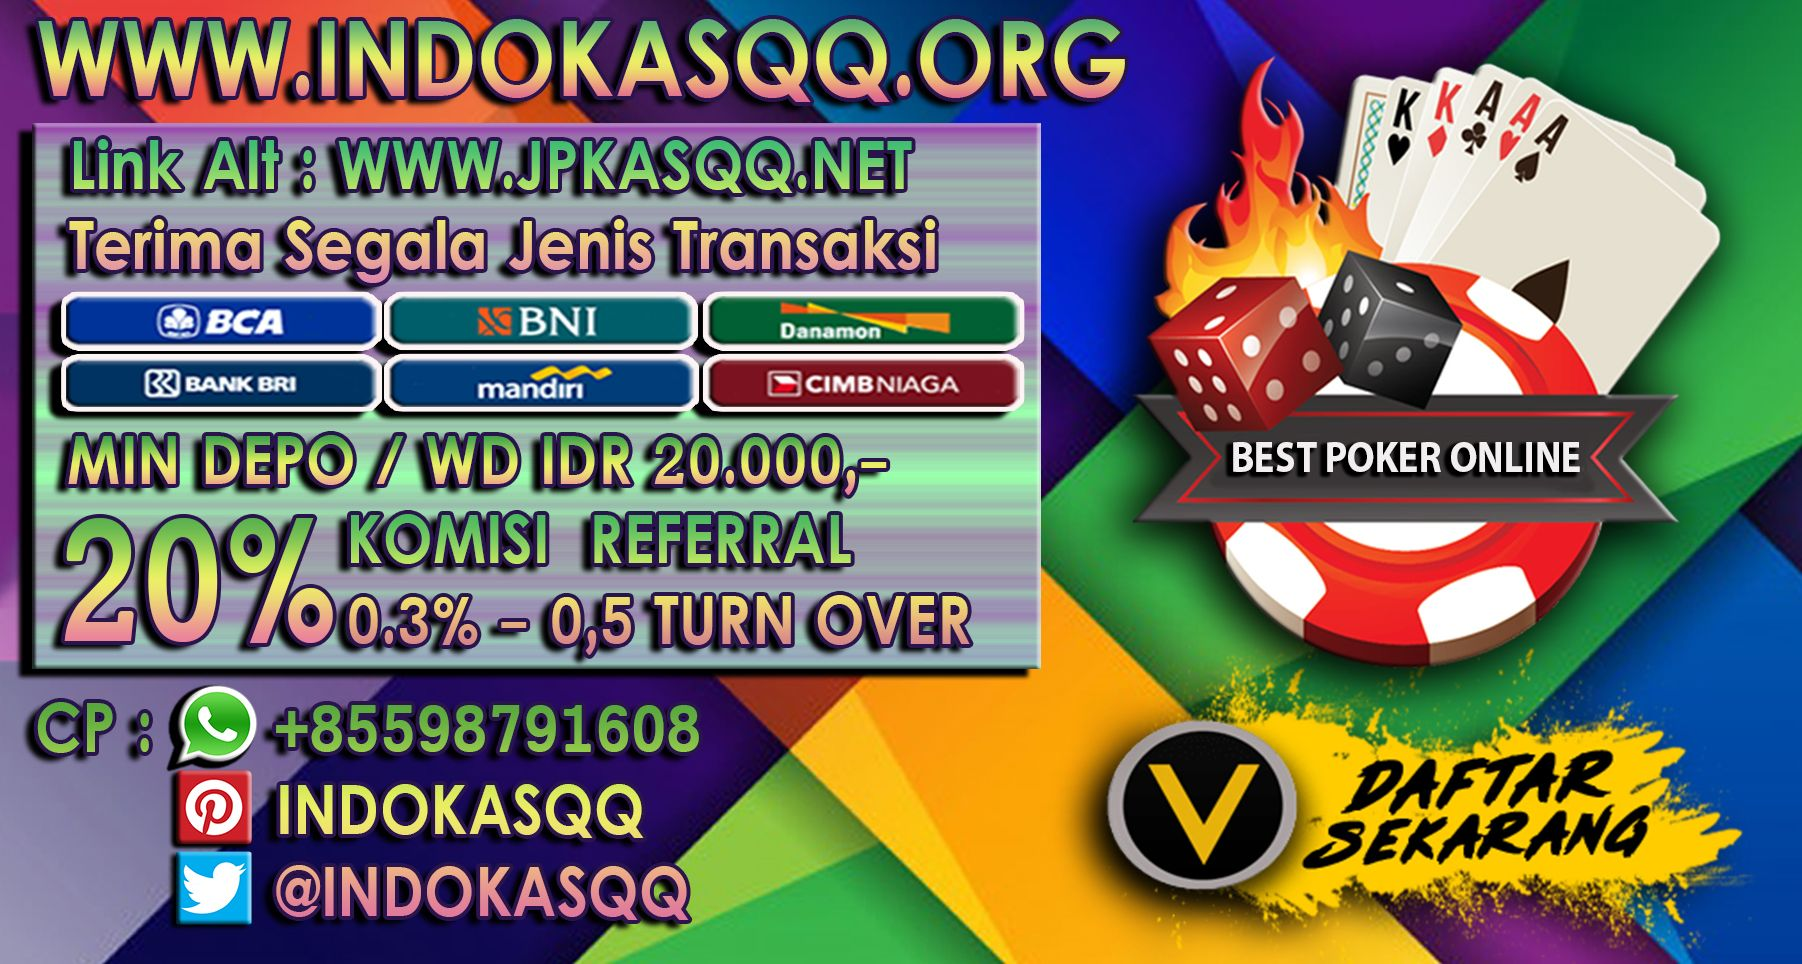 Poker Pokeronline Kasqq Indokasqq Jpkasqq Bandarpoker Ceme Cemekeliling Domino Dominoqq Domino99 Qq 99 Agendomin Bandar Jackpot Video Game Covers